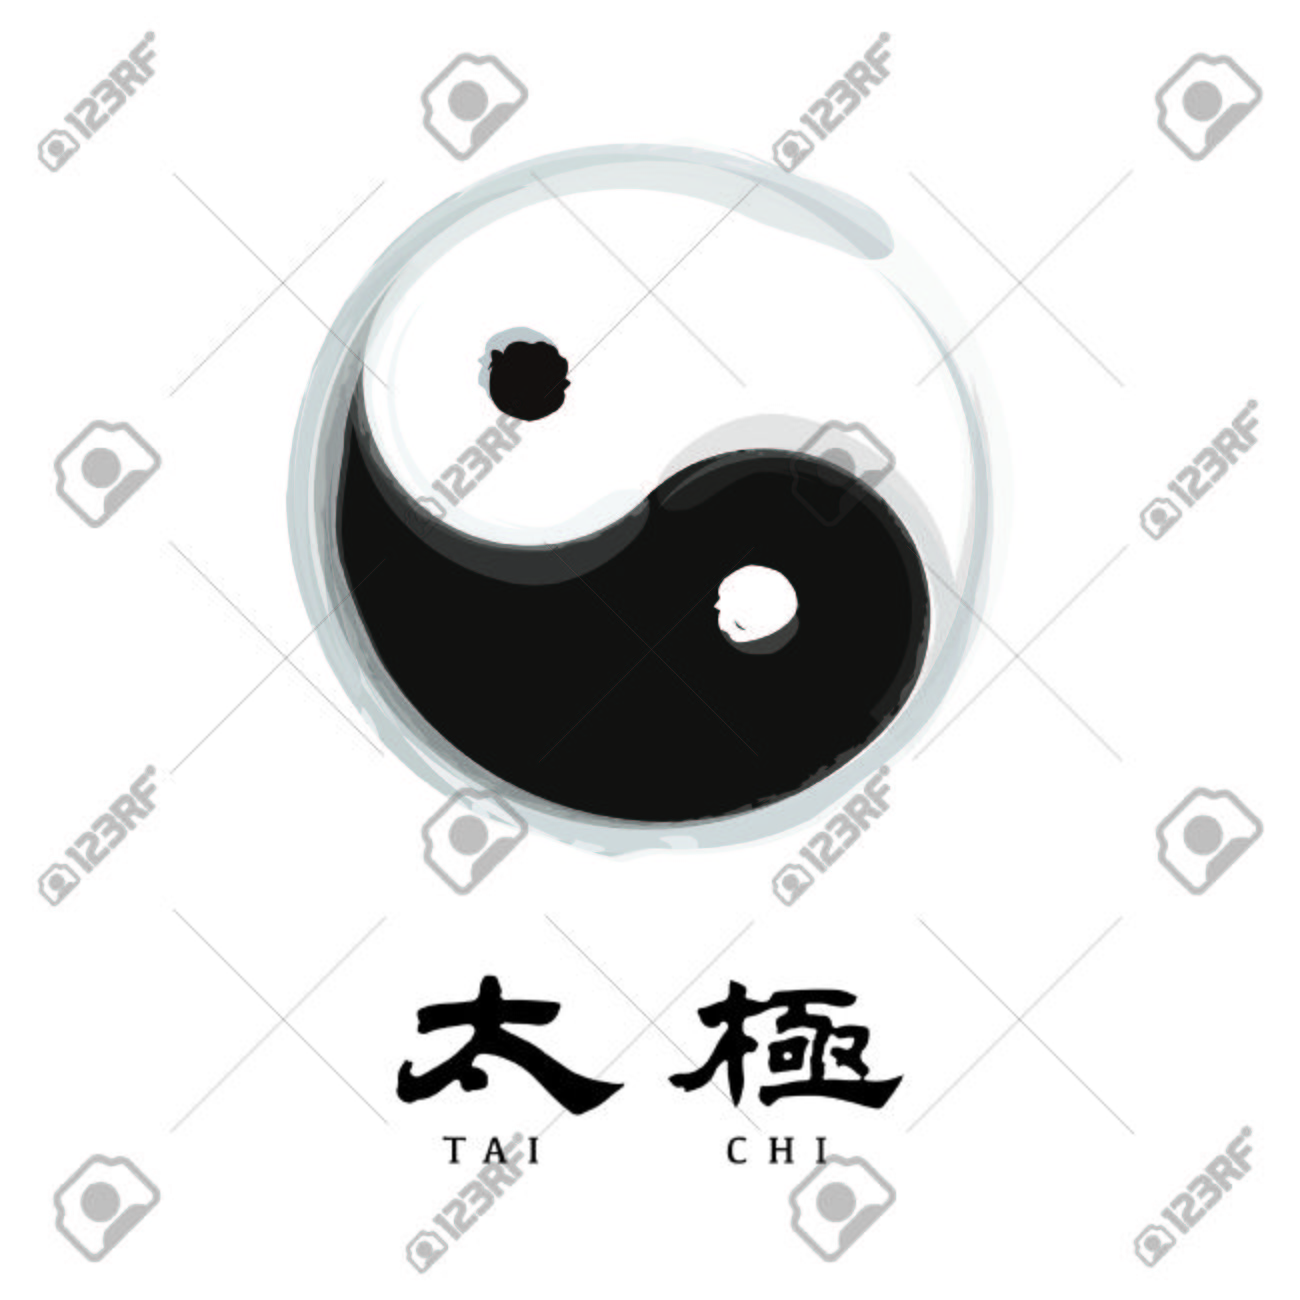 1428 Tai Chi Stock Vector Illustration And Royalty Free Tai Chi Clipart